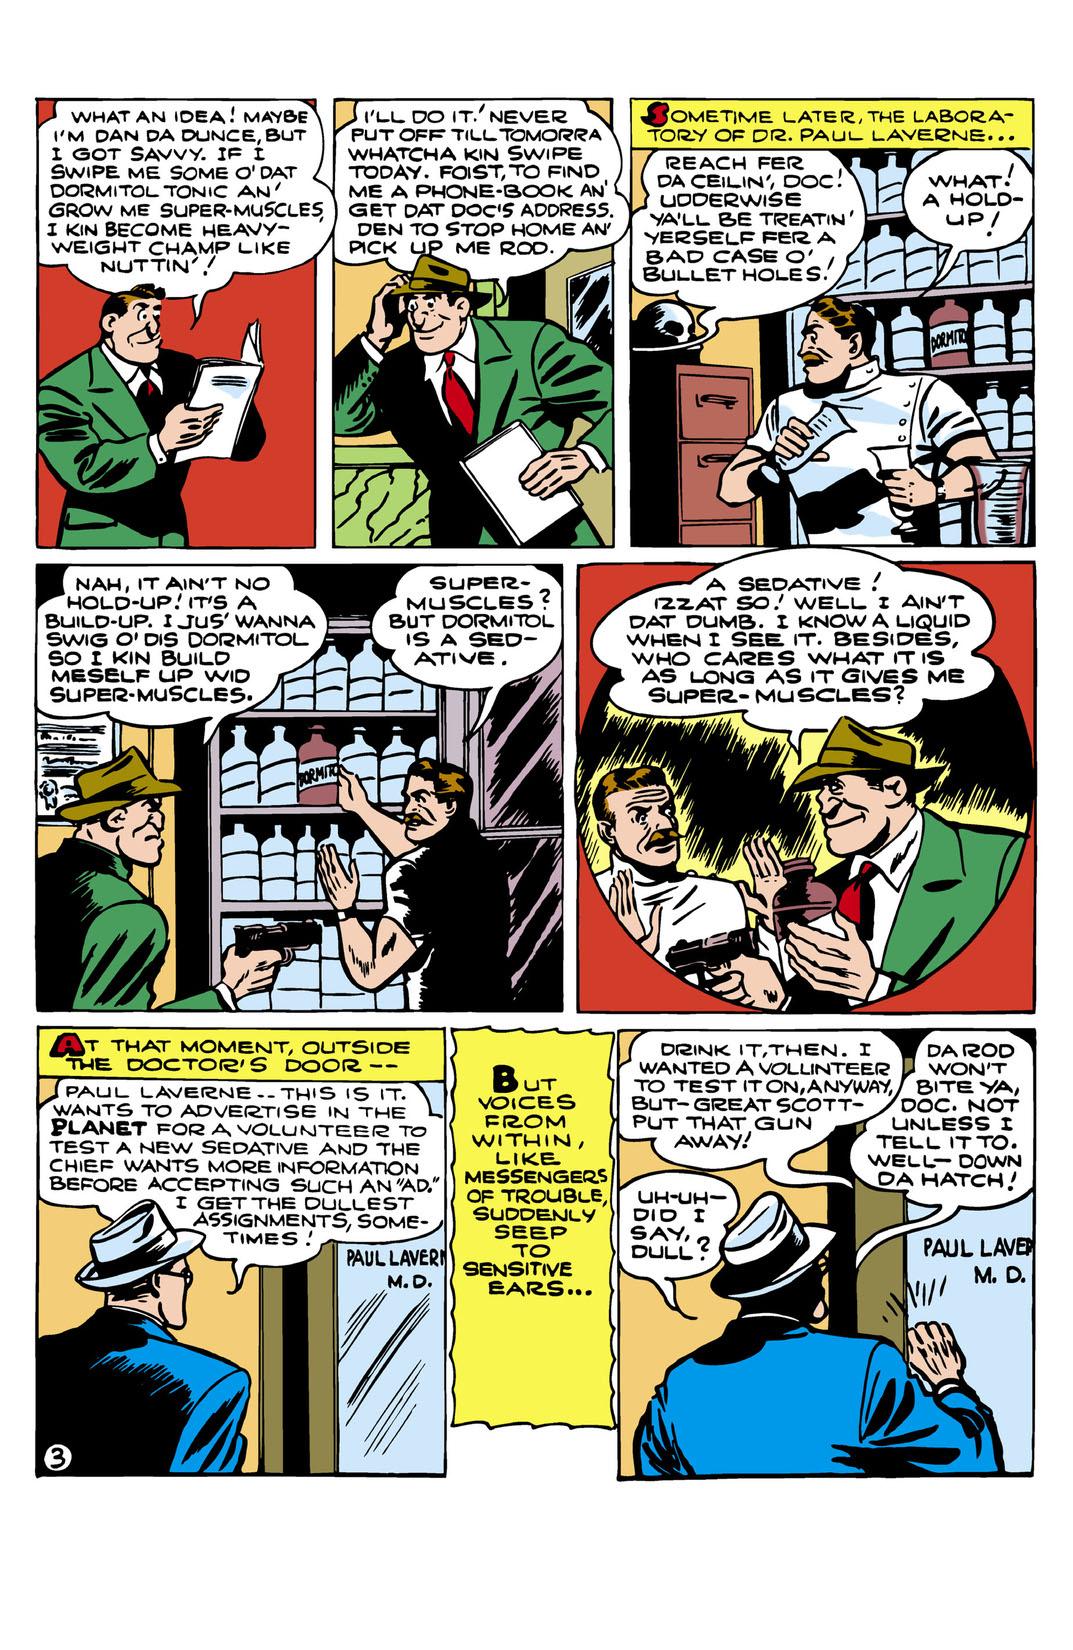 Read World's Finest Comics (1941-) #31 on DC Universe